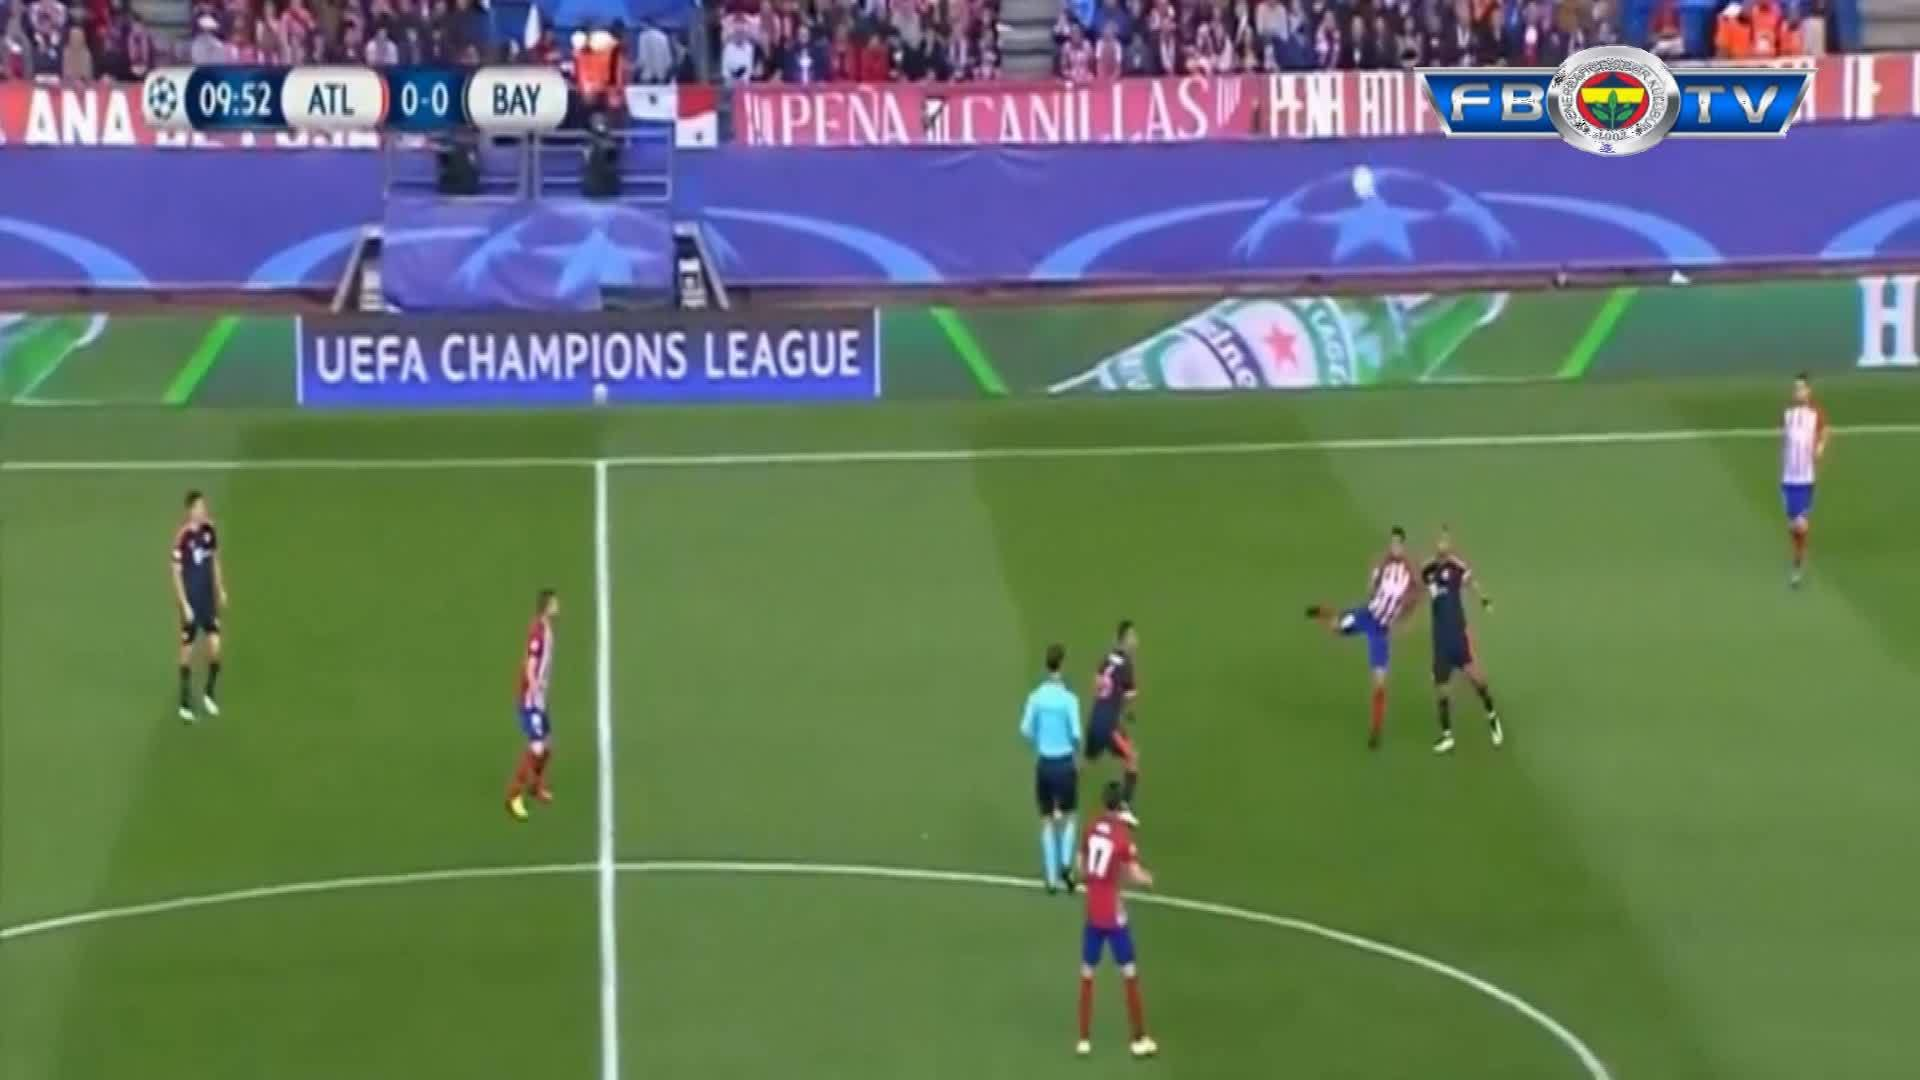 soccergifs, Atletico Madrid vs Bayern Munich ● 1-0 ● 27.04.2016 GIFs